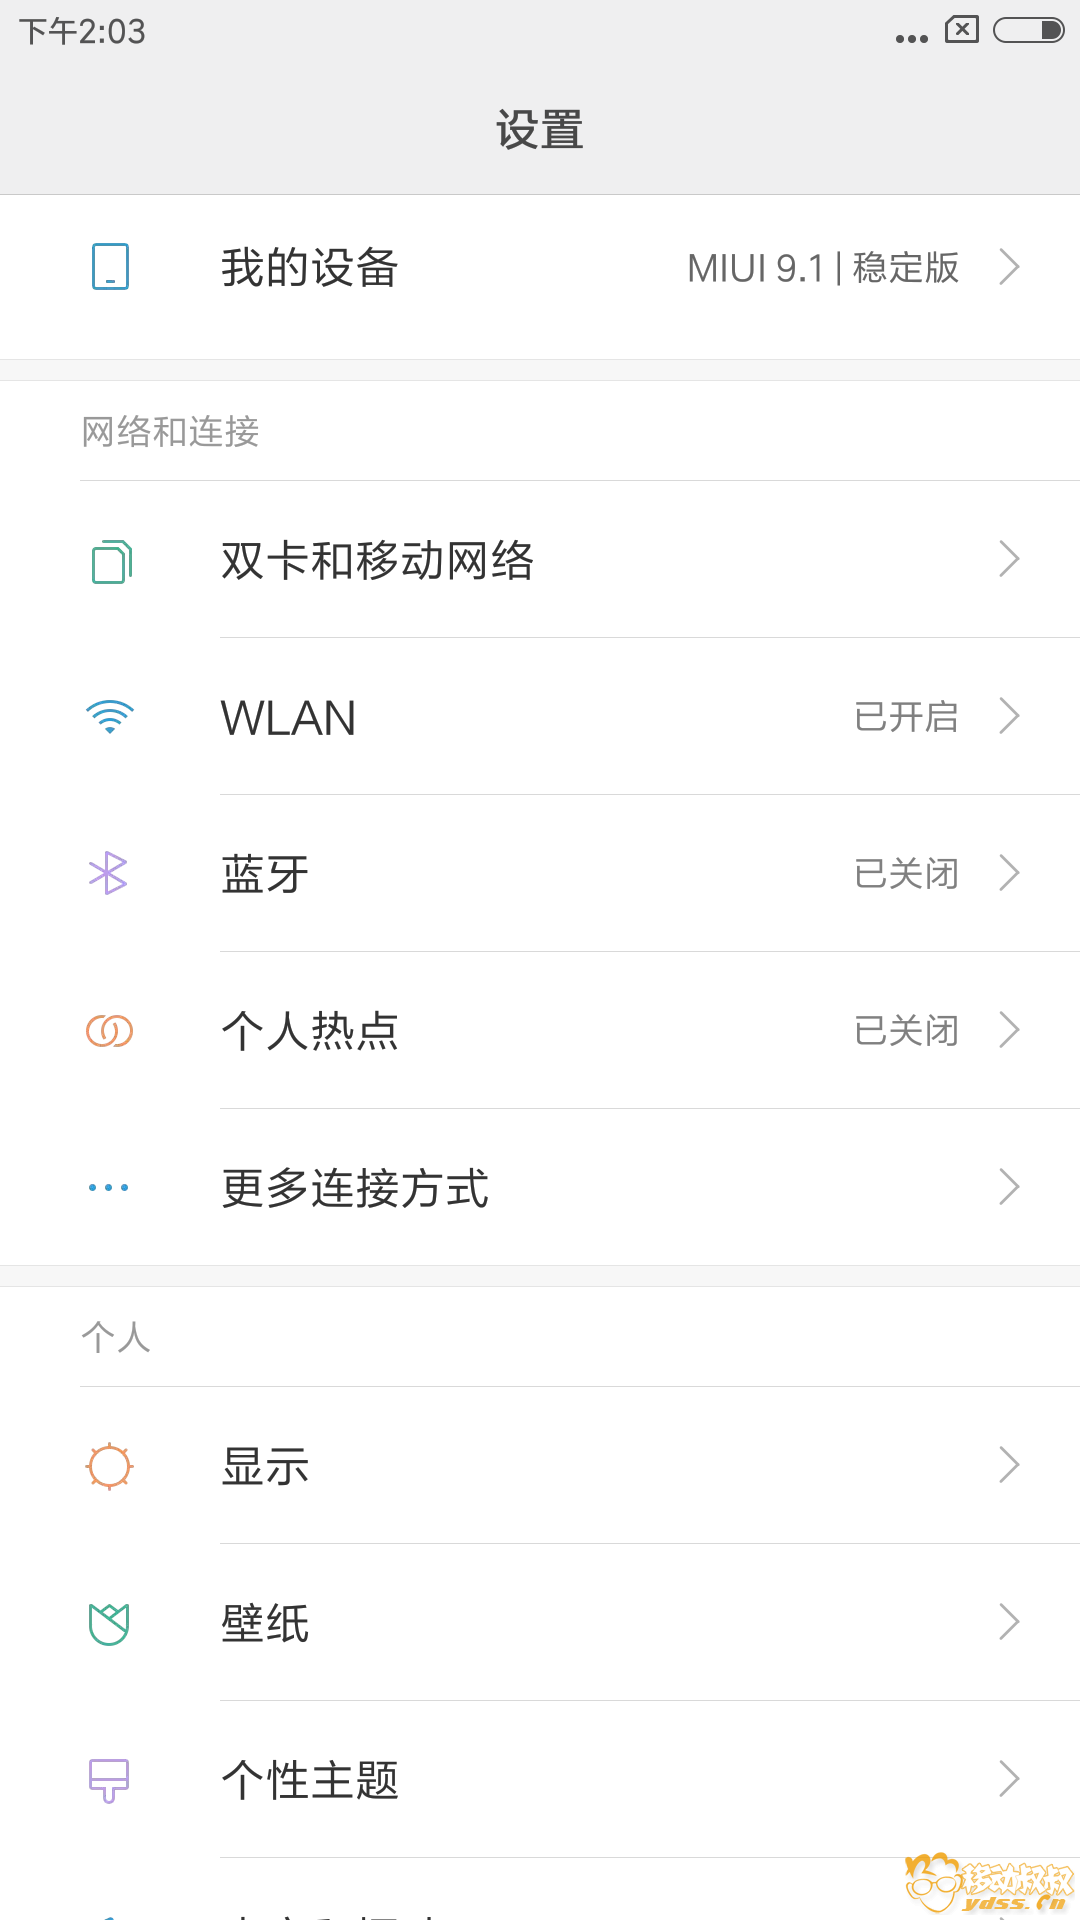 Screenshot_2017-12-25-14-03-26-501_com.android.settings.png